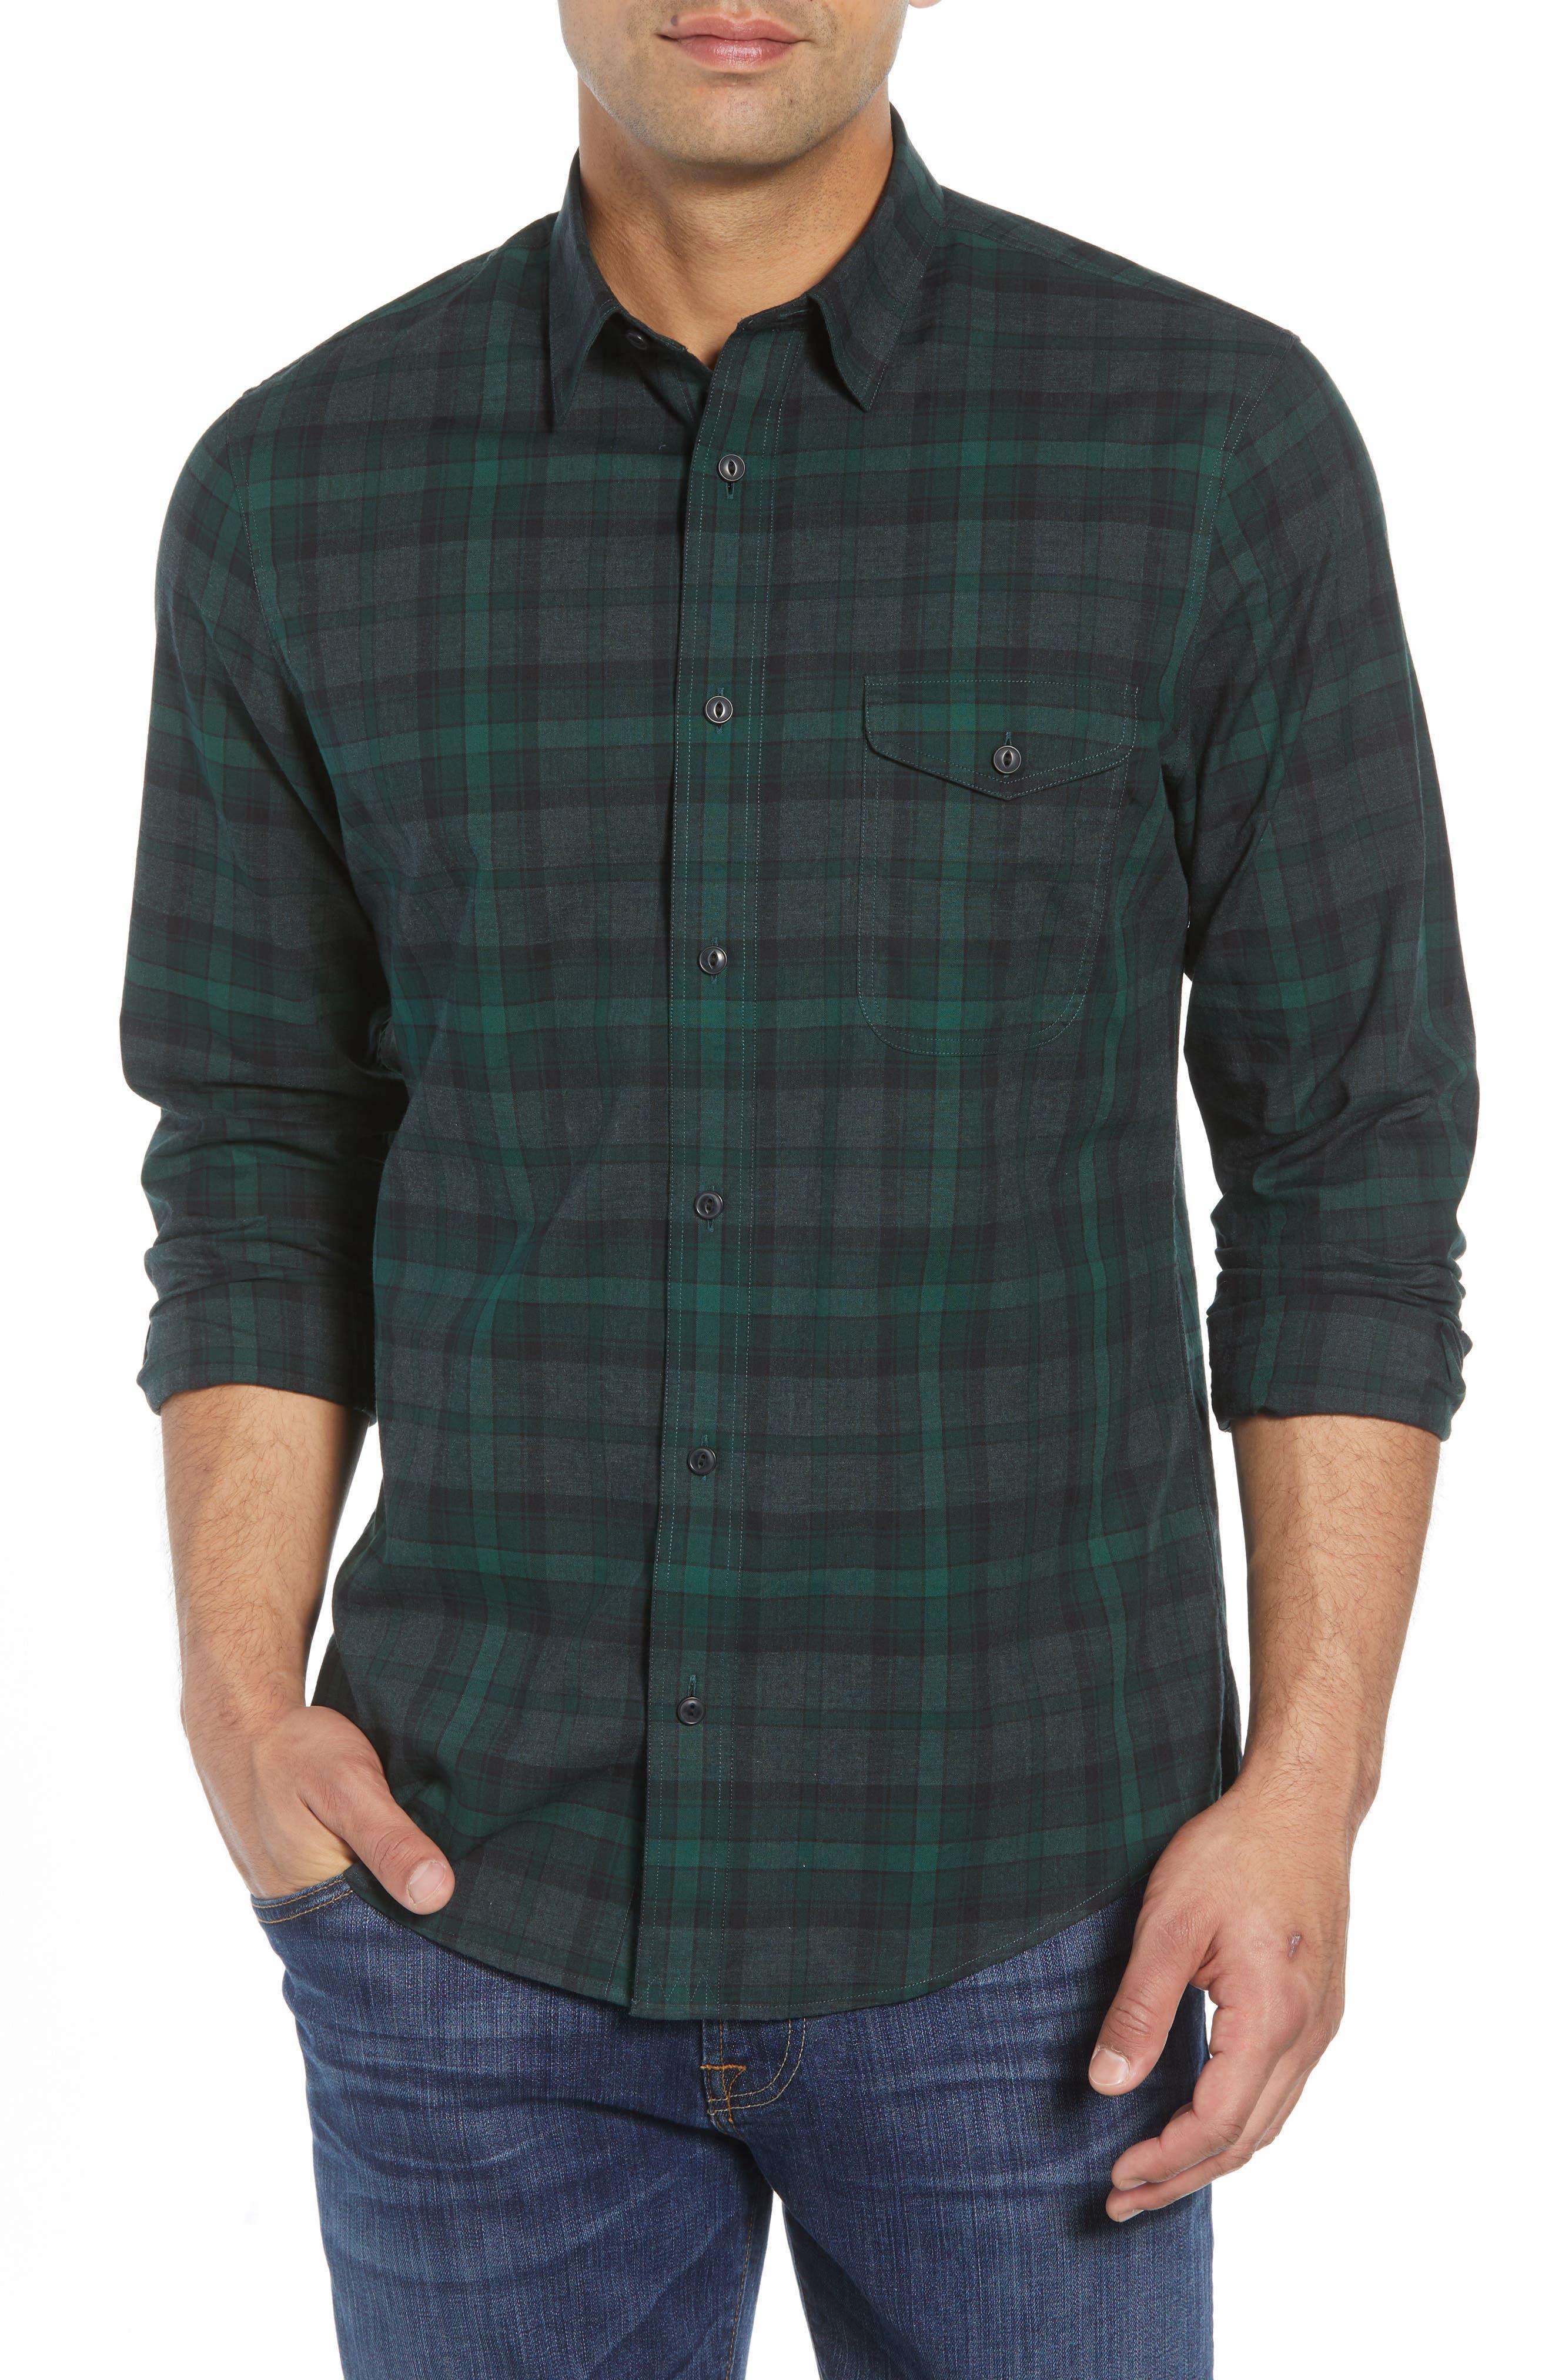 Regular Fit Plaid Flannel Sport Shirt,                             Main thumbnail 1, color,                             GREEN FOREST GREY PLAID